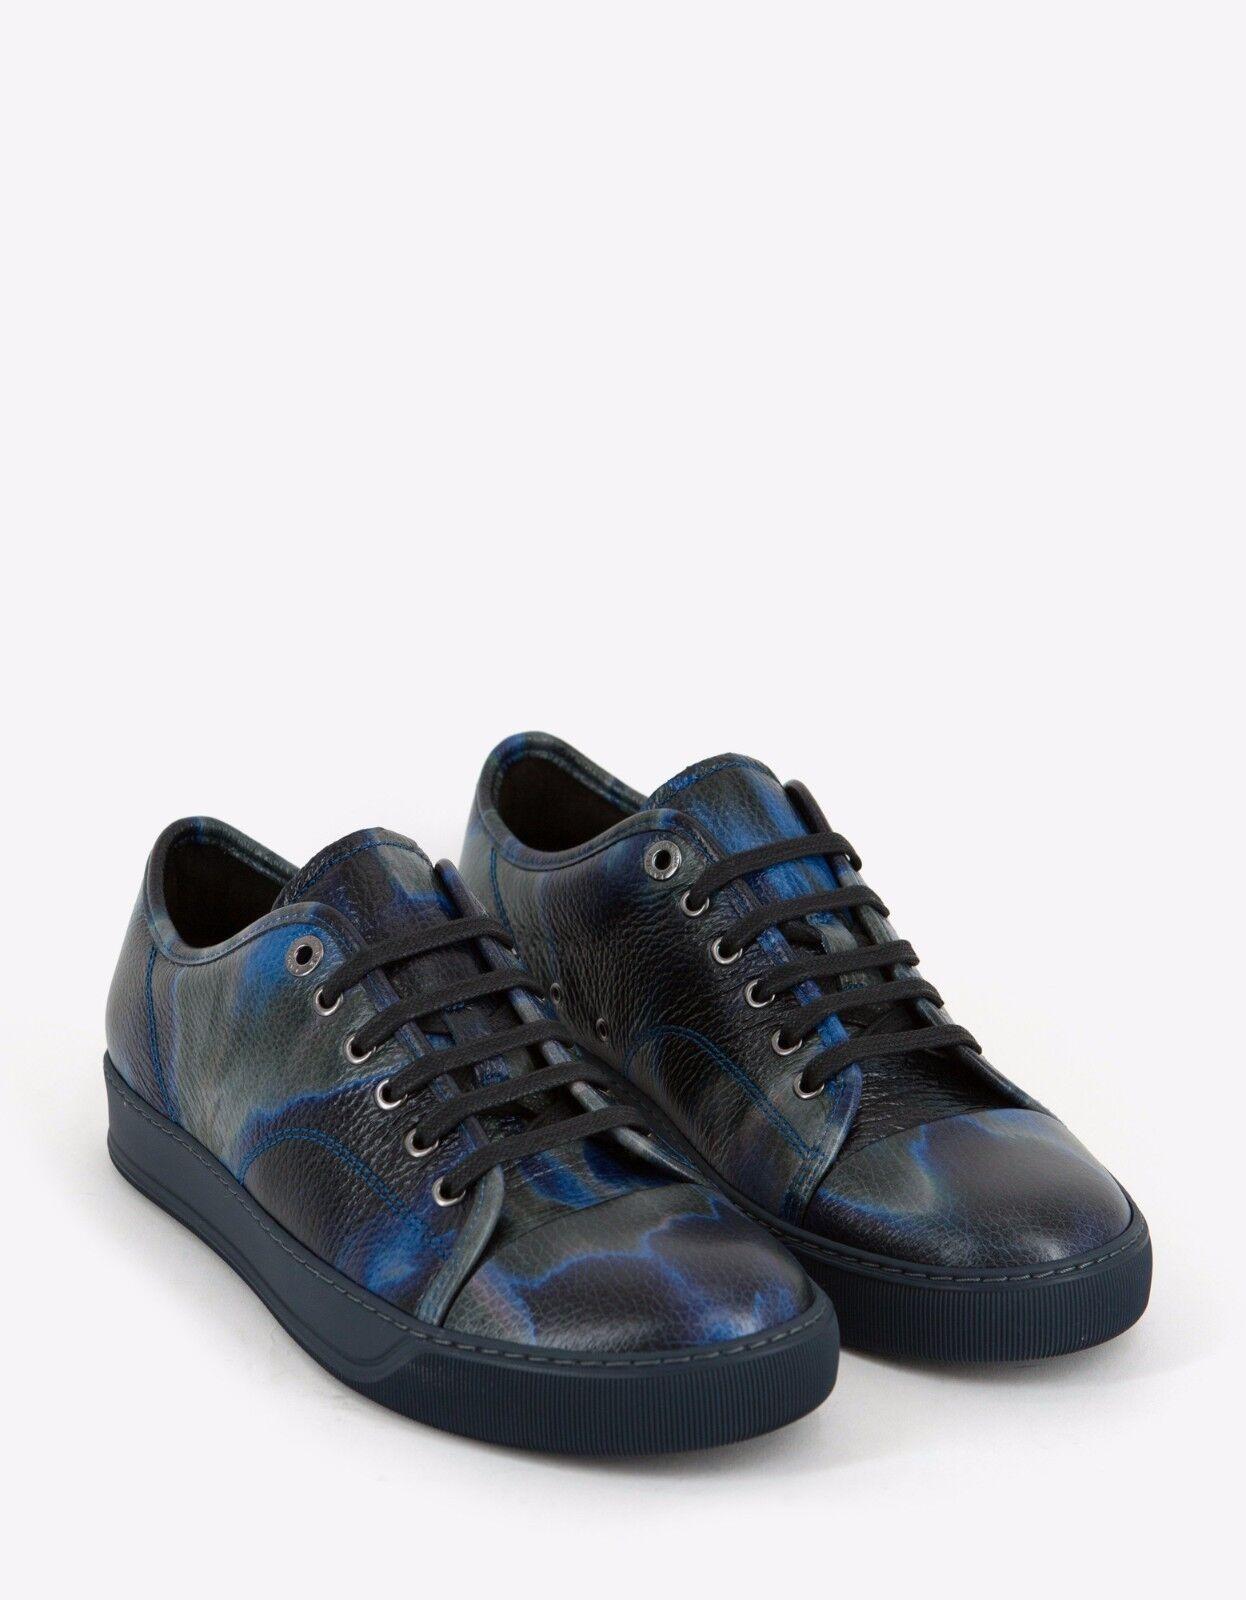 New Lanvin Azul Tye & Dye Dye Dye Print Leather Trainers Talla 5  455 BNWT 7da468